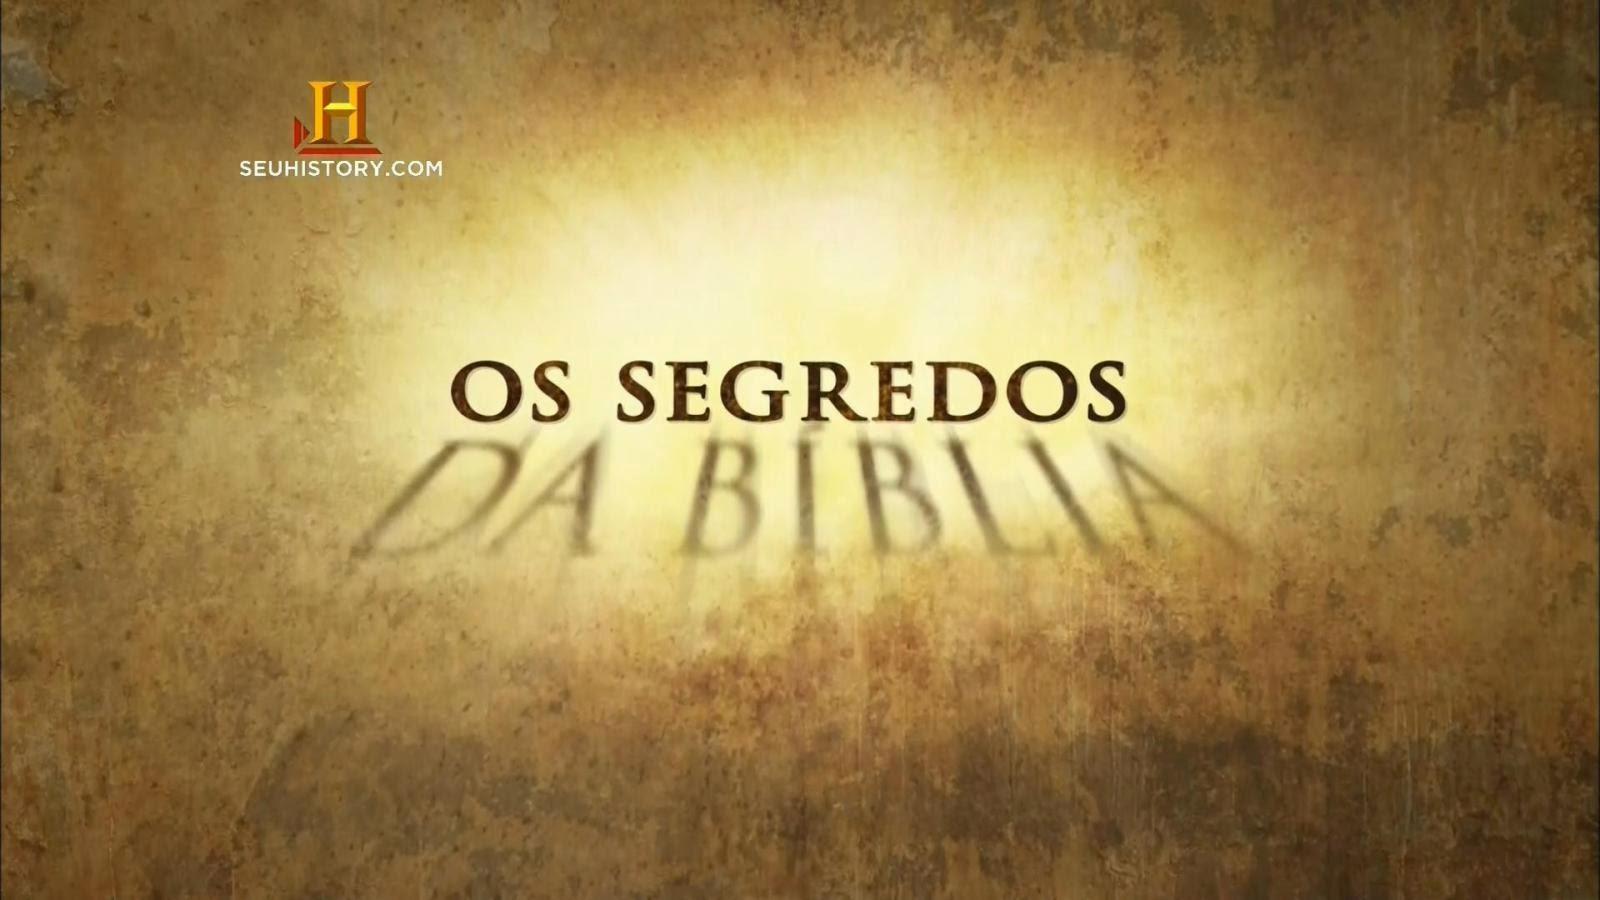 capa Download – History Channel   Os Segredos da Bíblia   S01E02   A Terra Prometida – HDTV Dublado